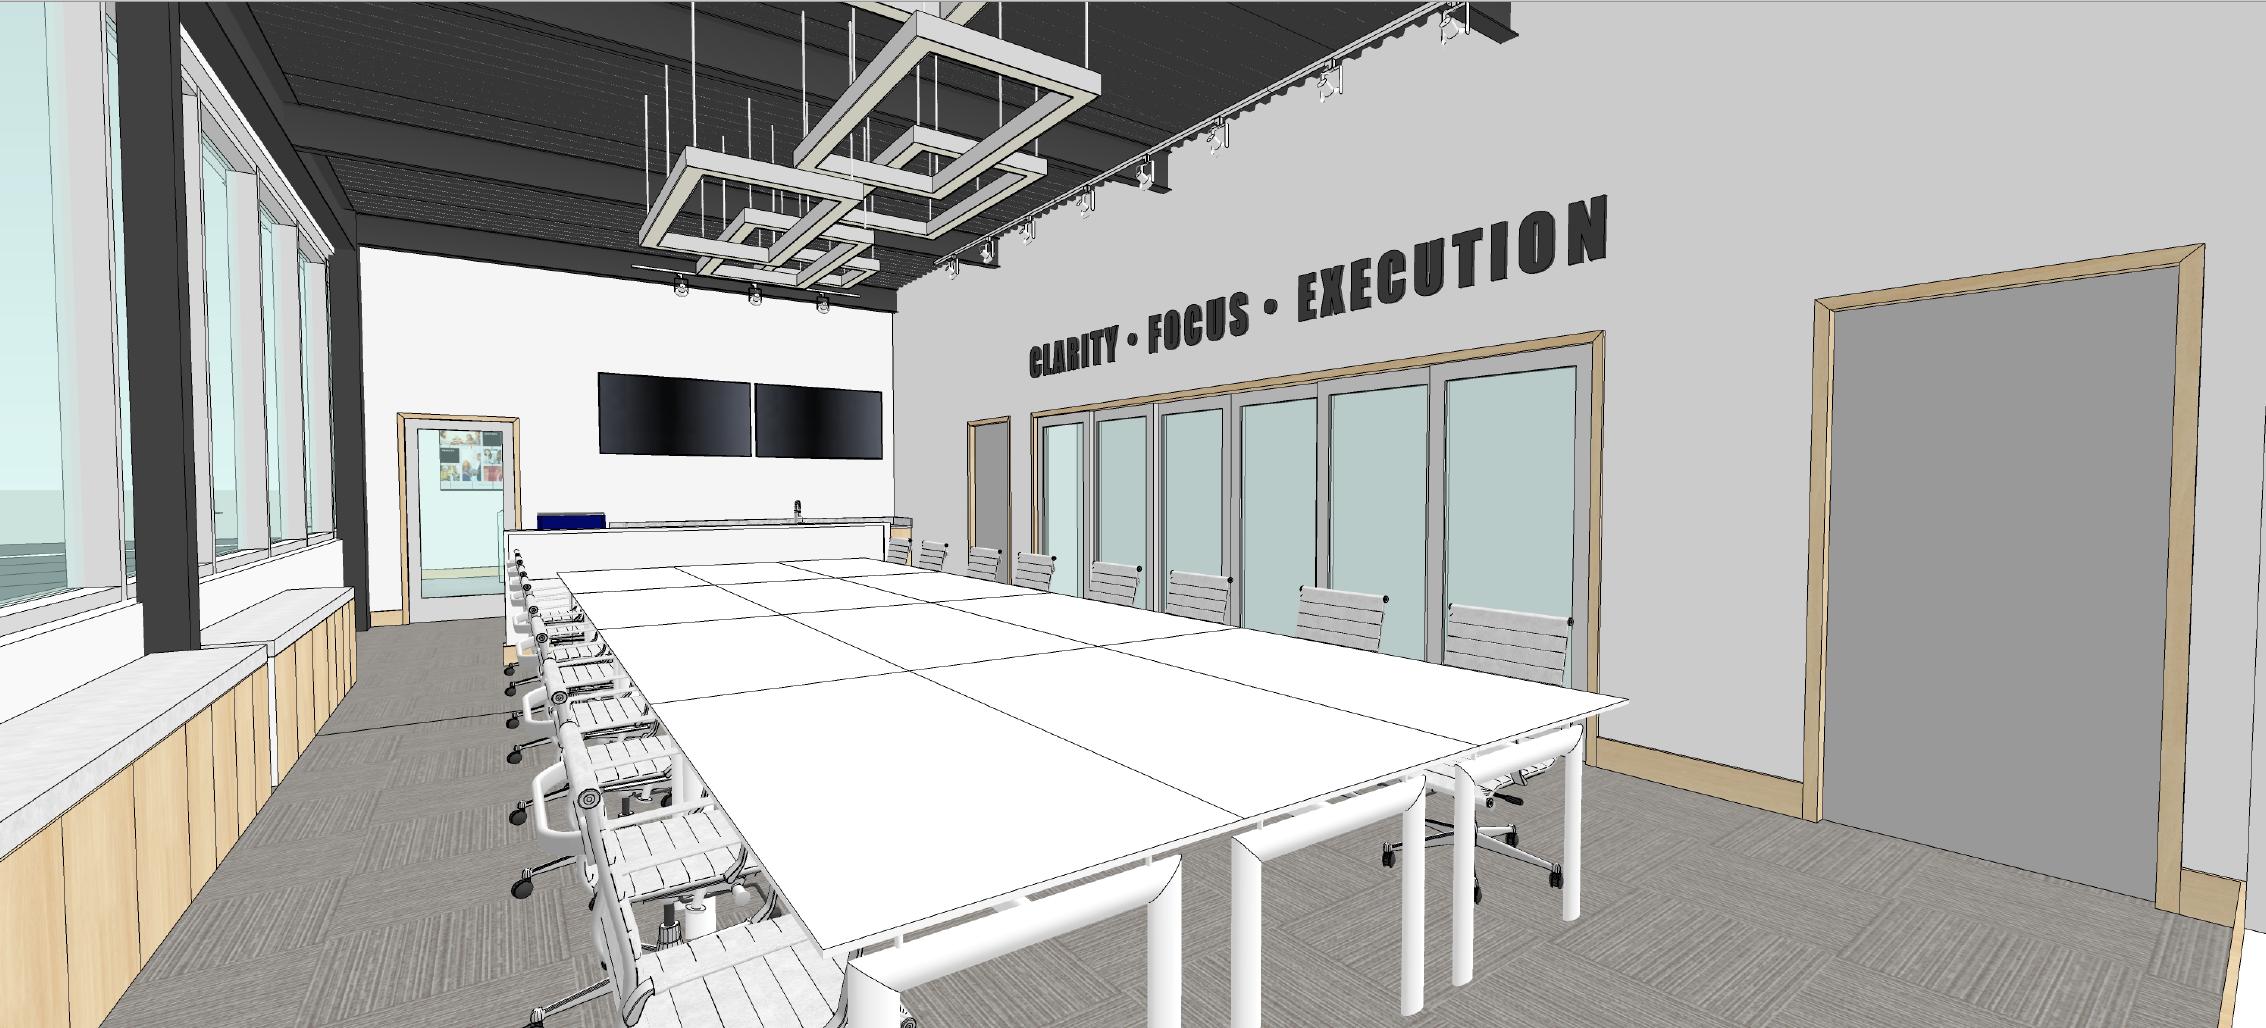 RESULTS Center Main Room